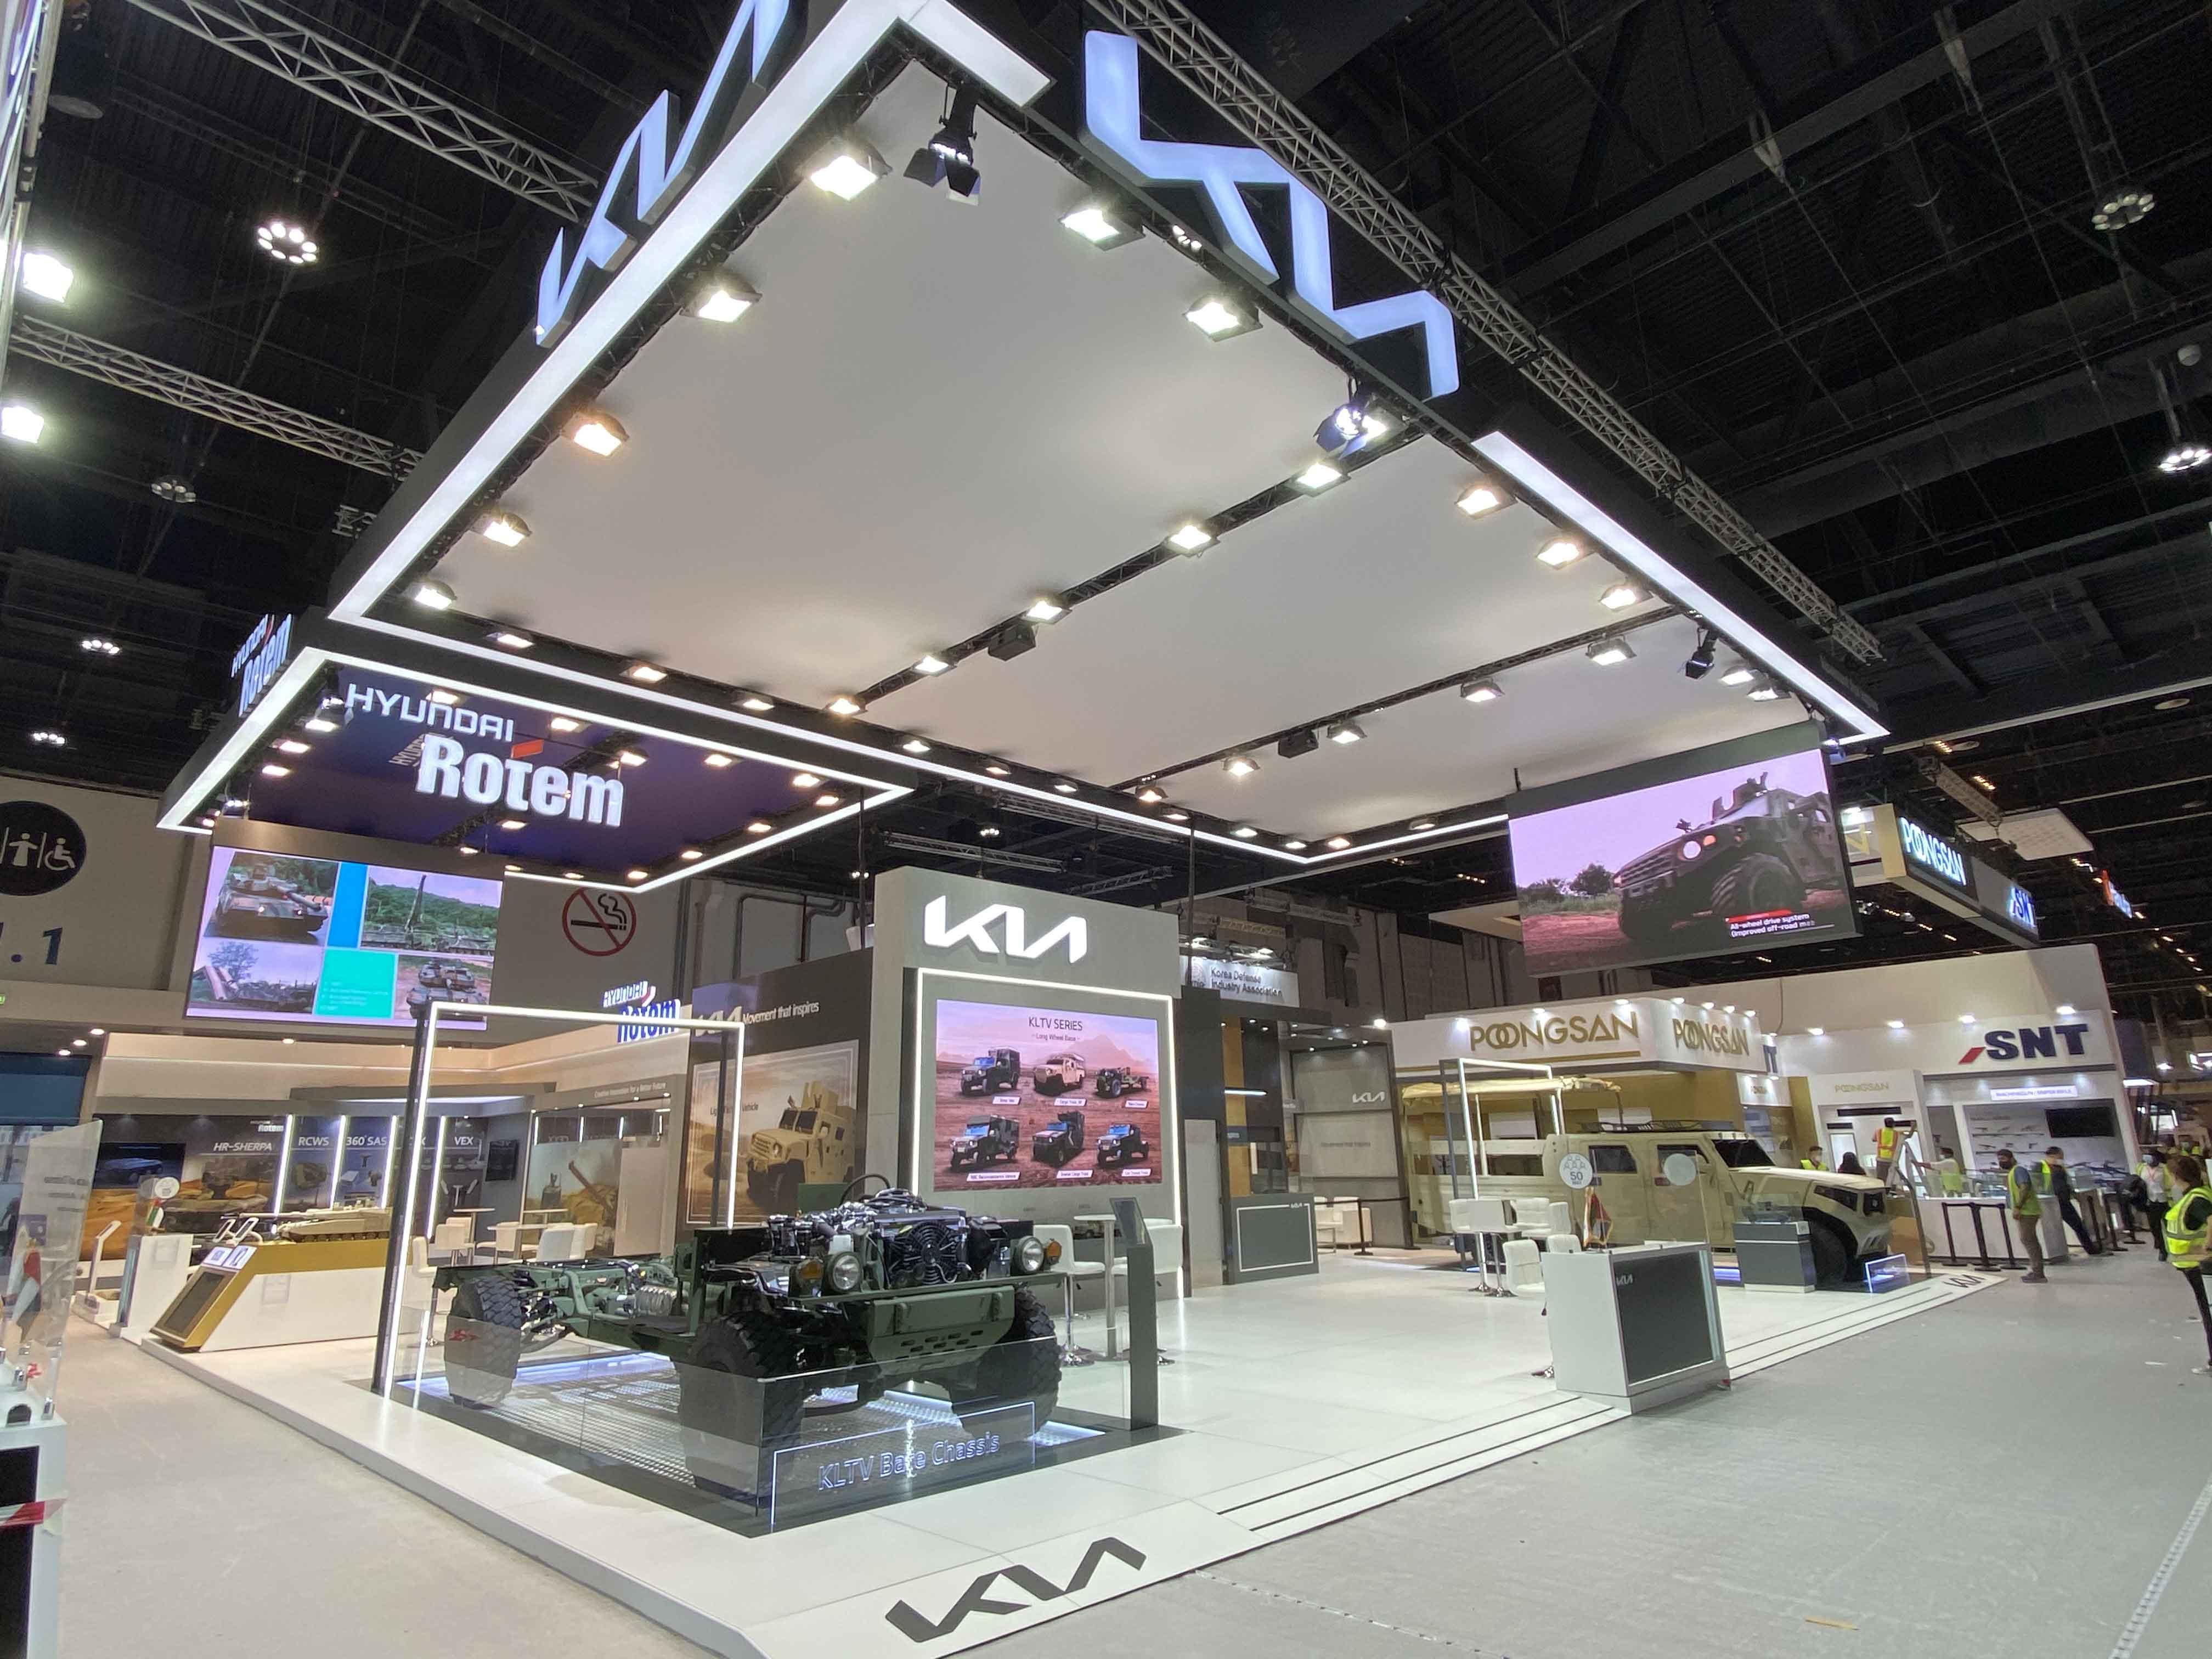 Kia showcases new defense vehicle technologies  at IDEX 2021 defense exhibition